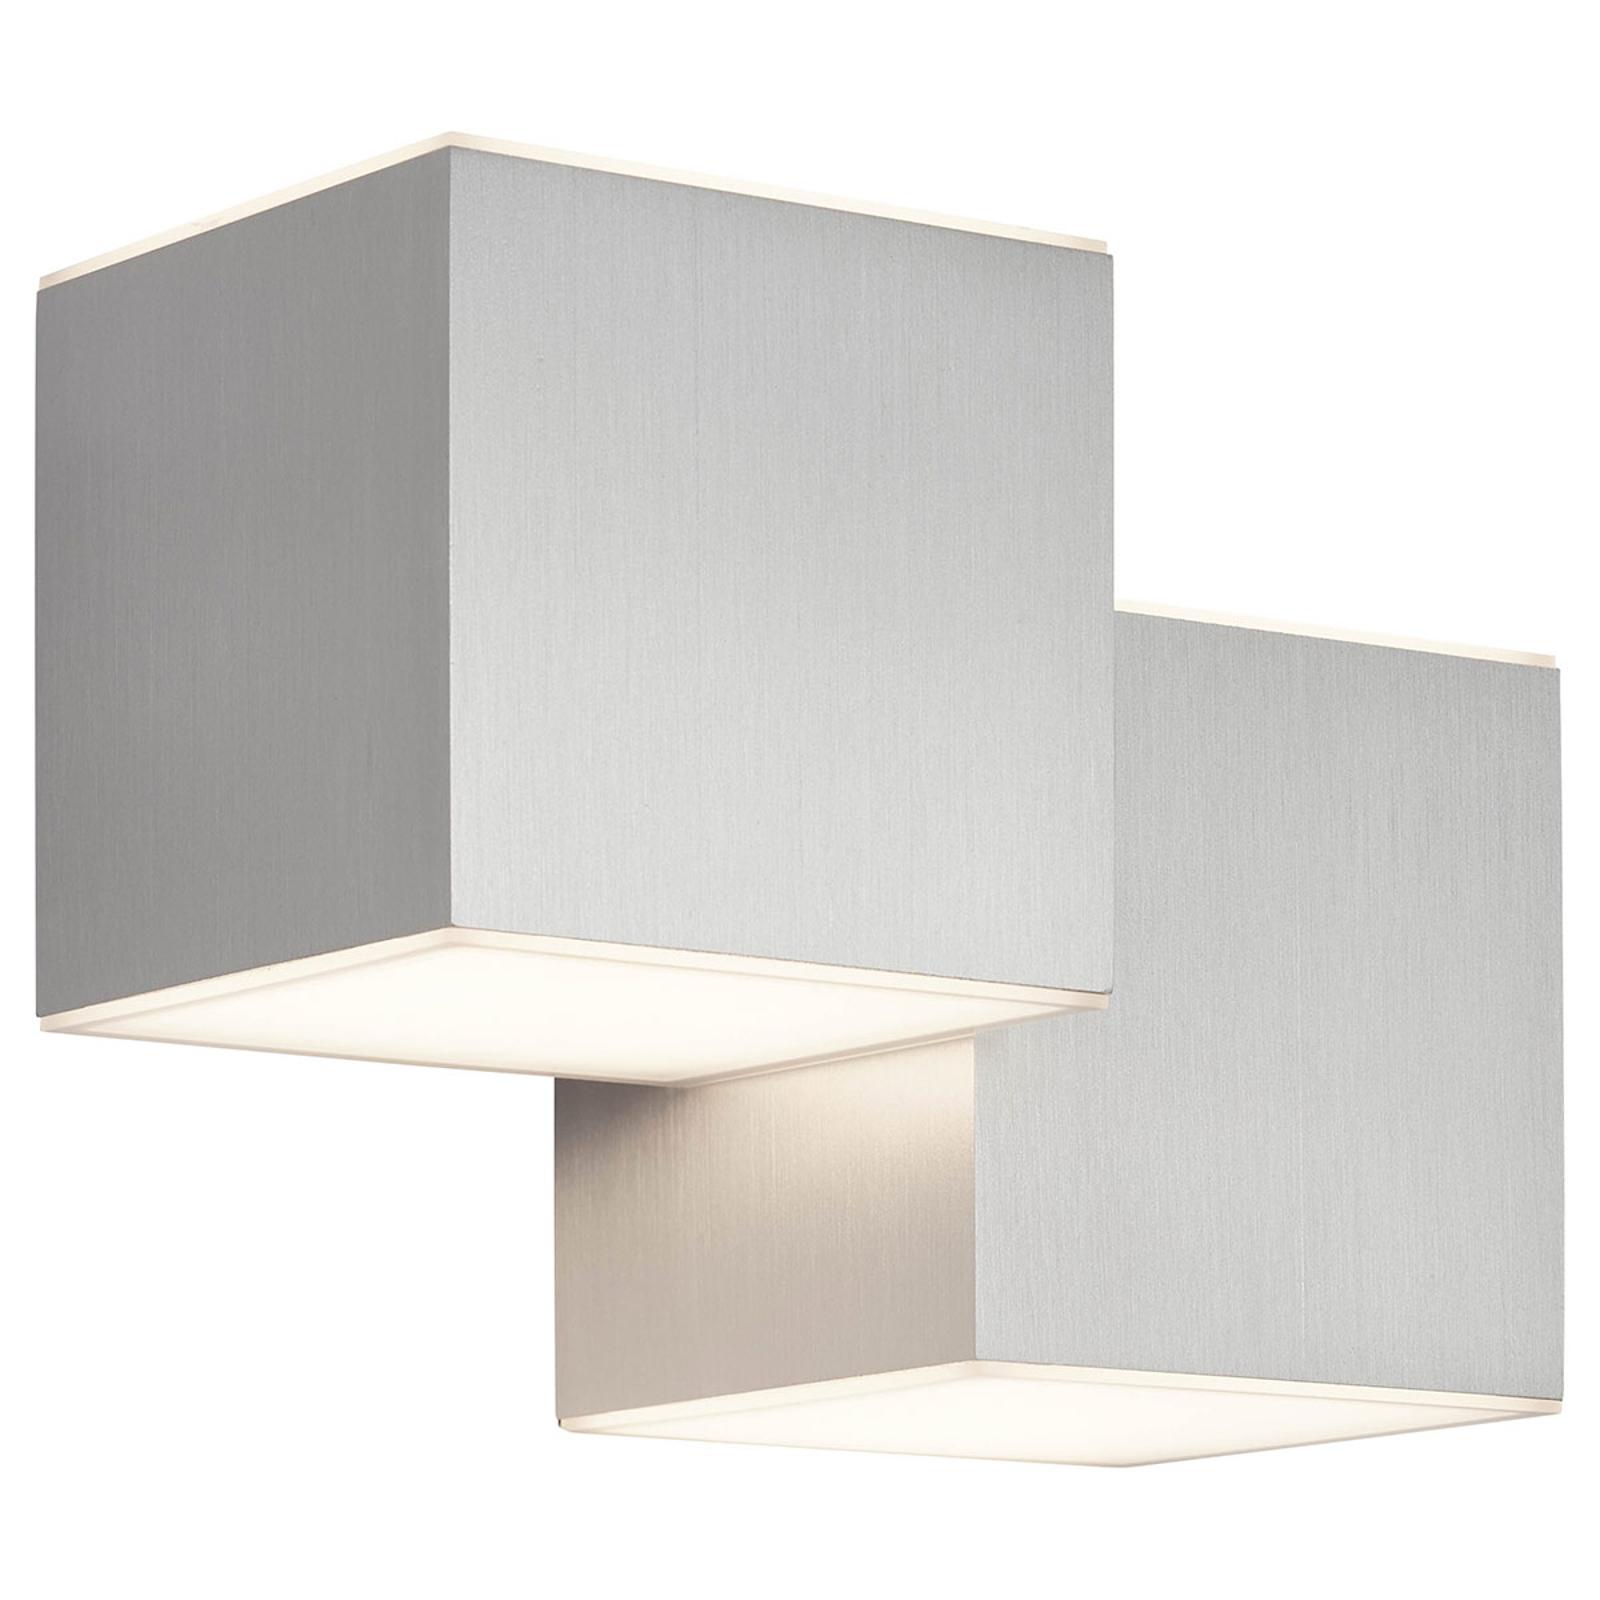 AEG Gillan LED wandlamp, 4 lampen